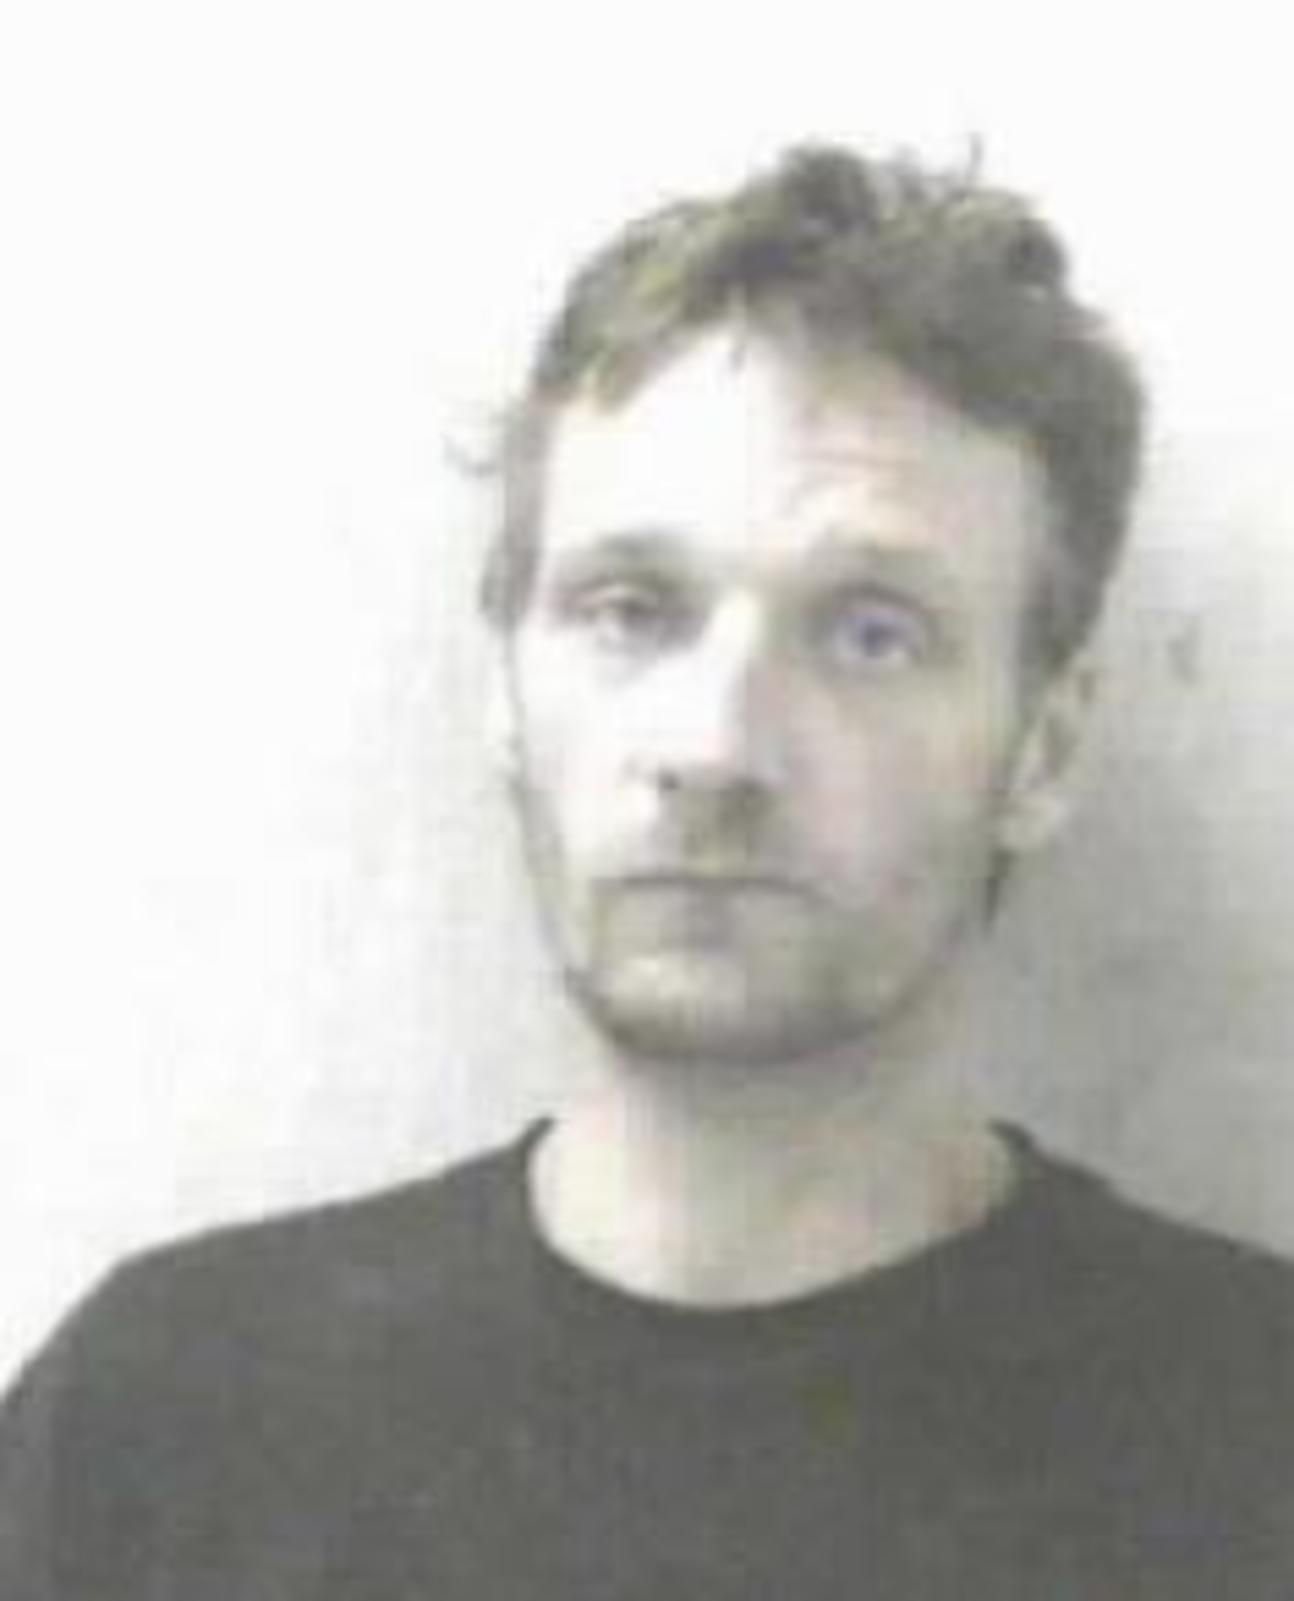 West virginia sex offender registry in putnam county